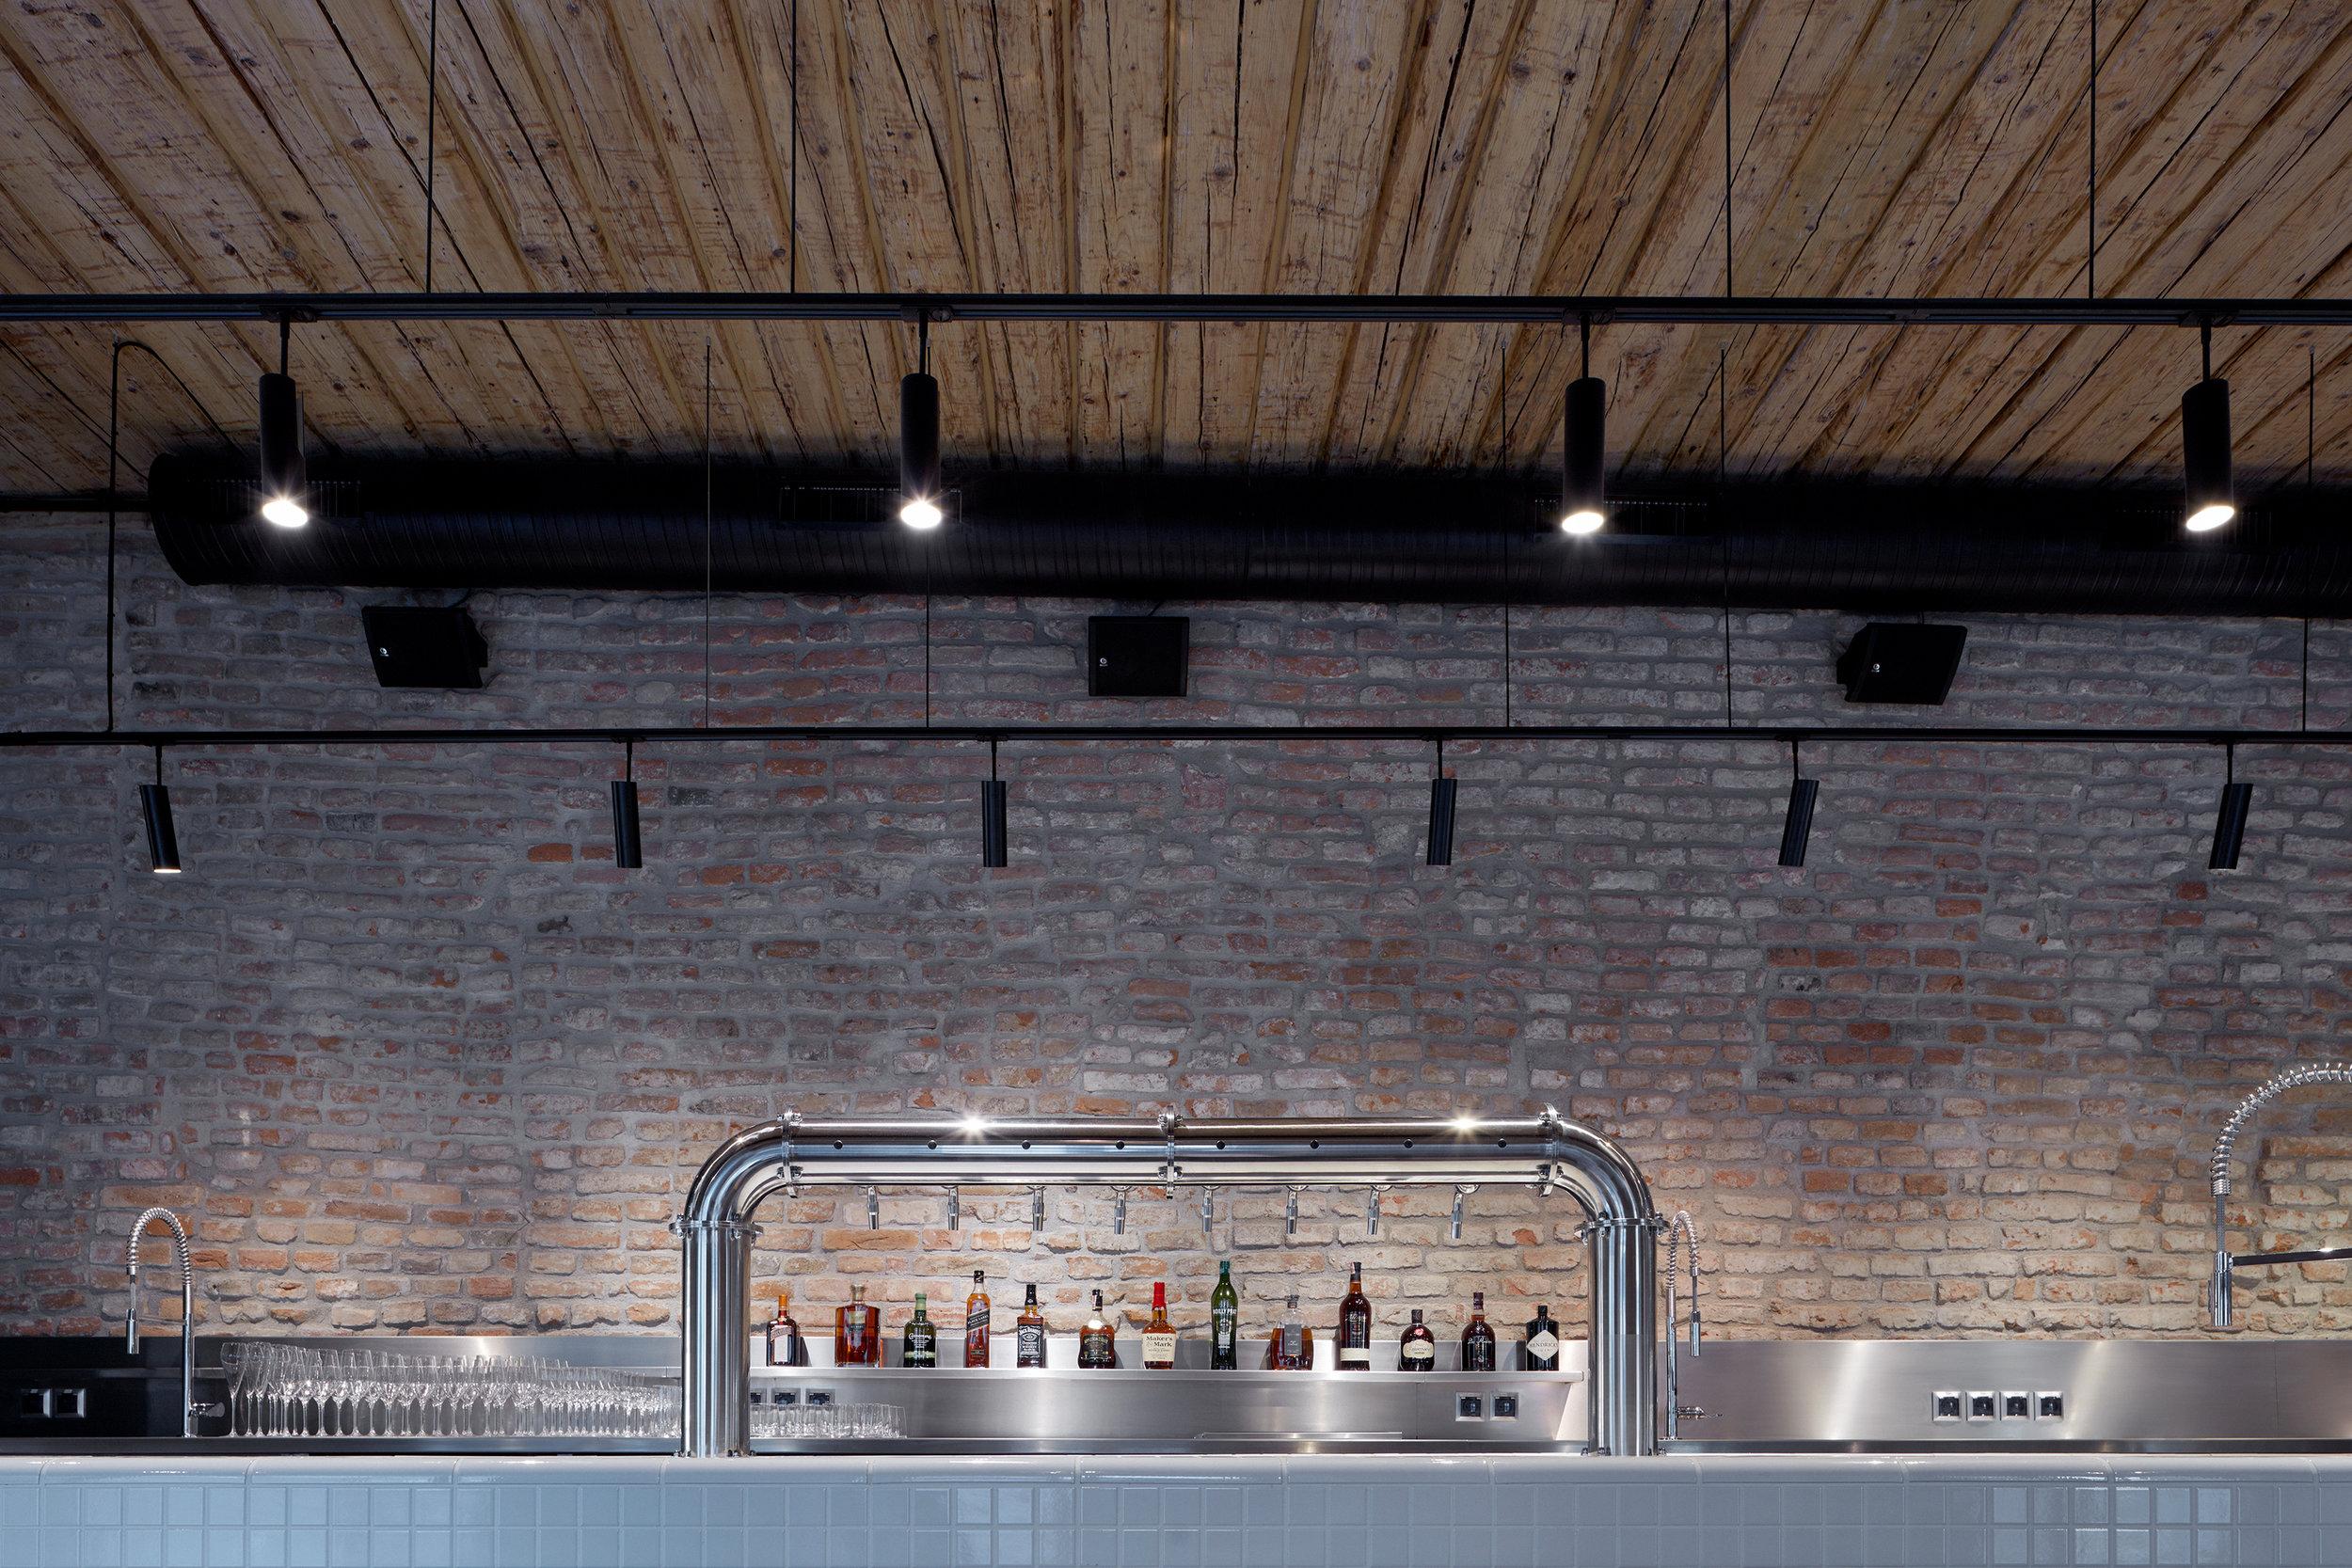 Vallo_Sadovsky_Architects_Nadvorie_BoysPlayNice_31.jpg